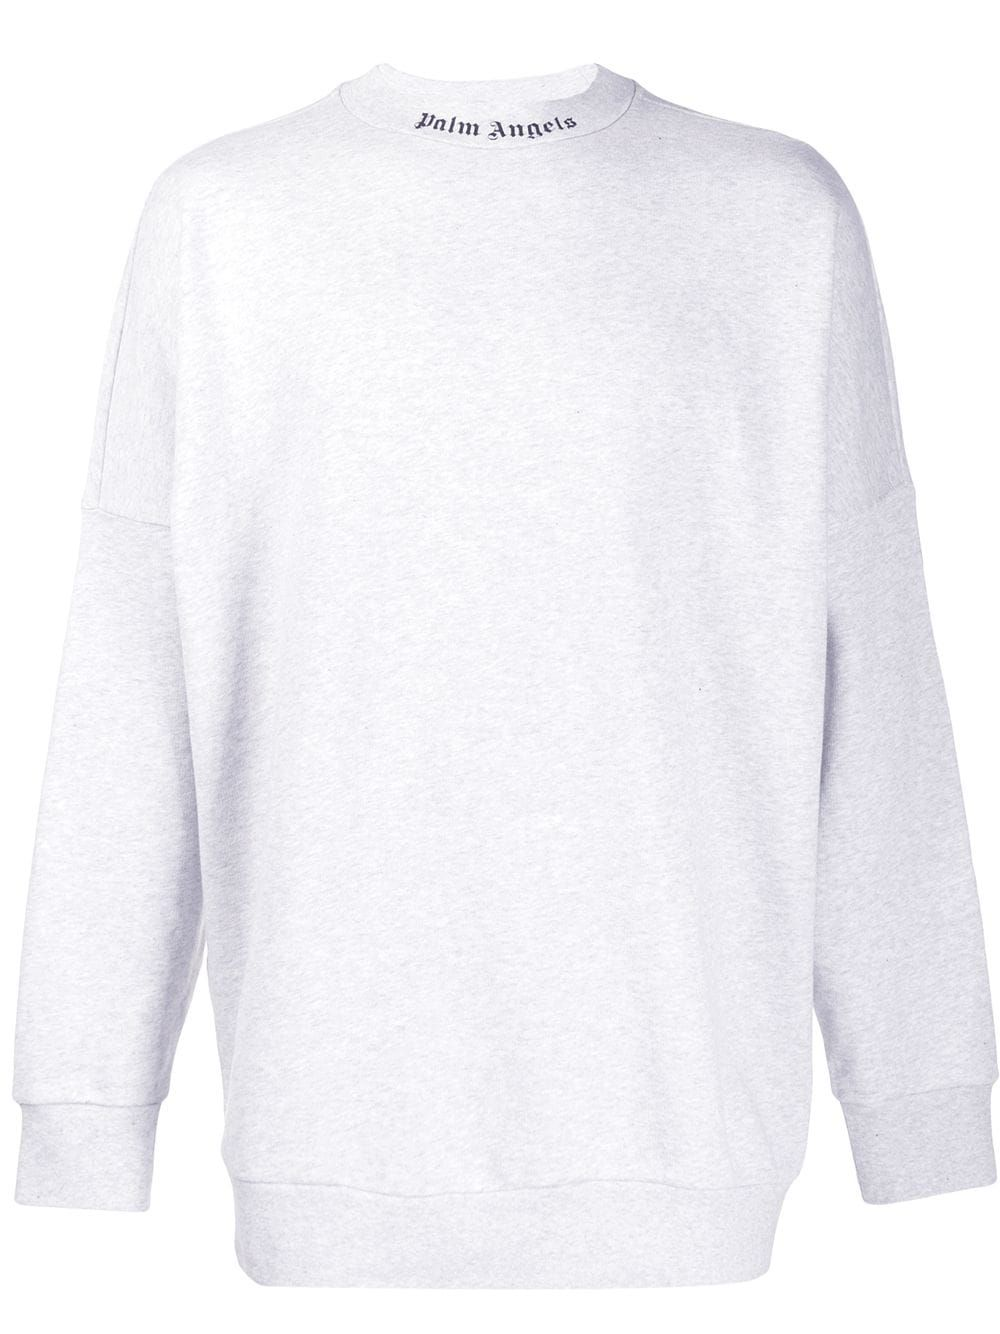 Palm Angels Logo Sweatshirt Farfetch [ 1334 x 1000 Pixel ]